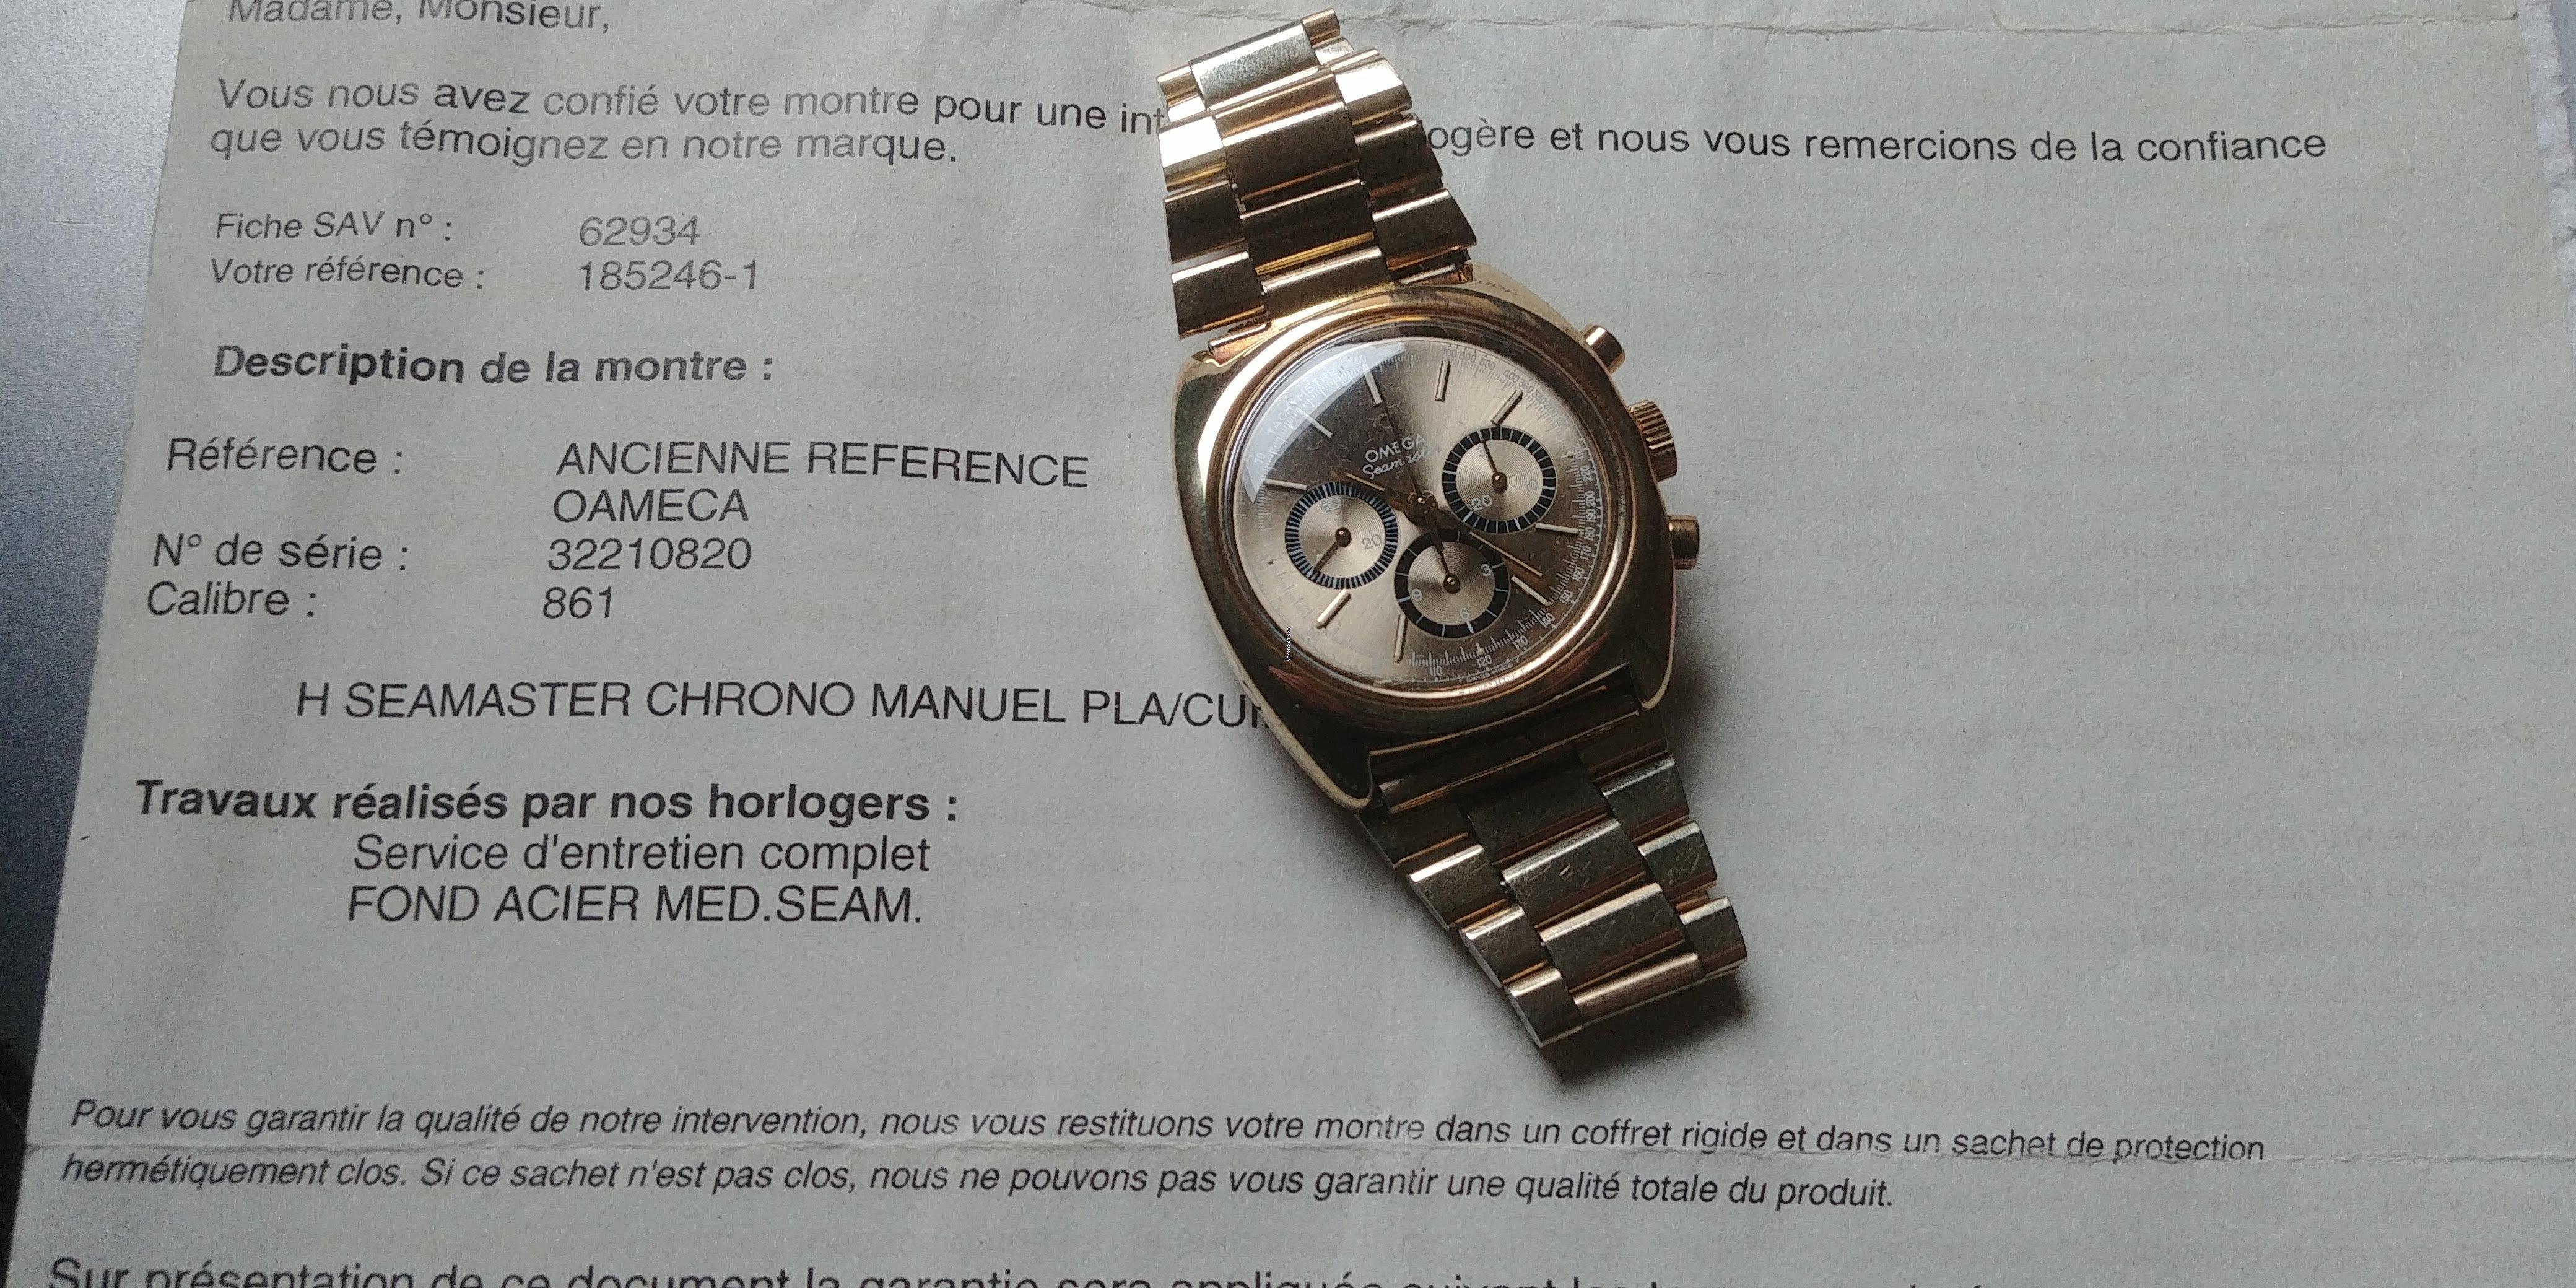 Omega Vintage Seamaster 861 Chronograph Für 2.700 € Kaufen dedans Monsieur Le Montre